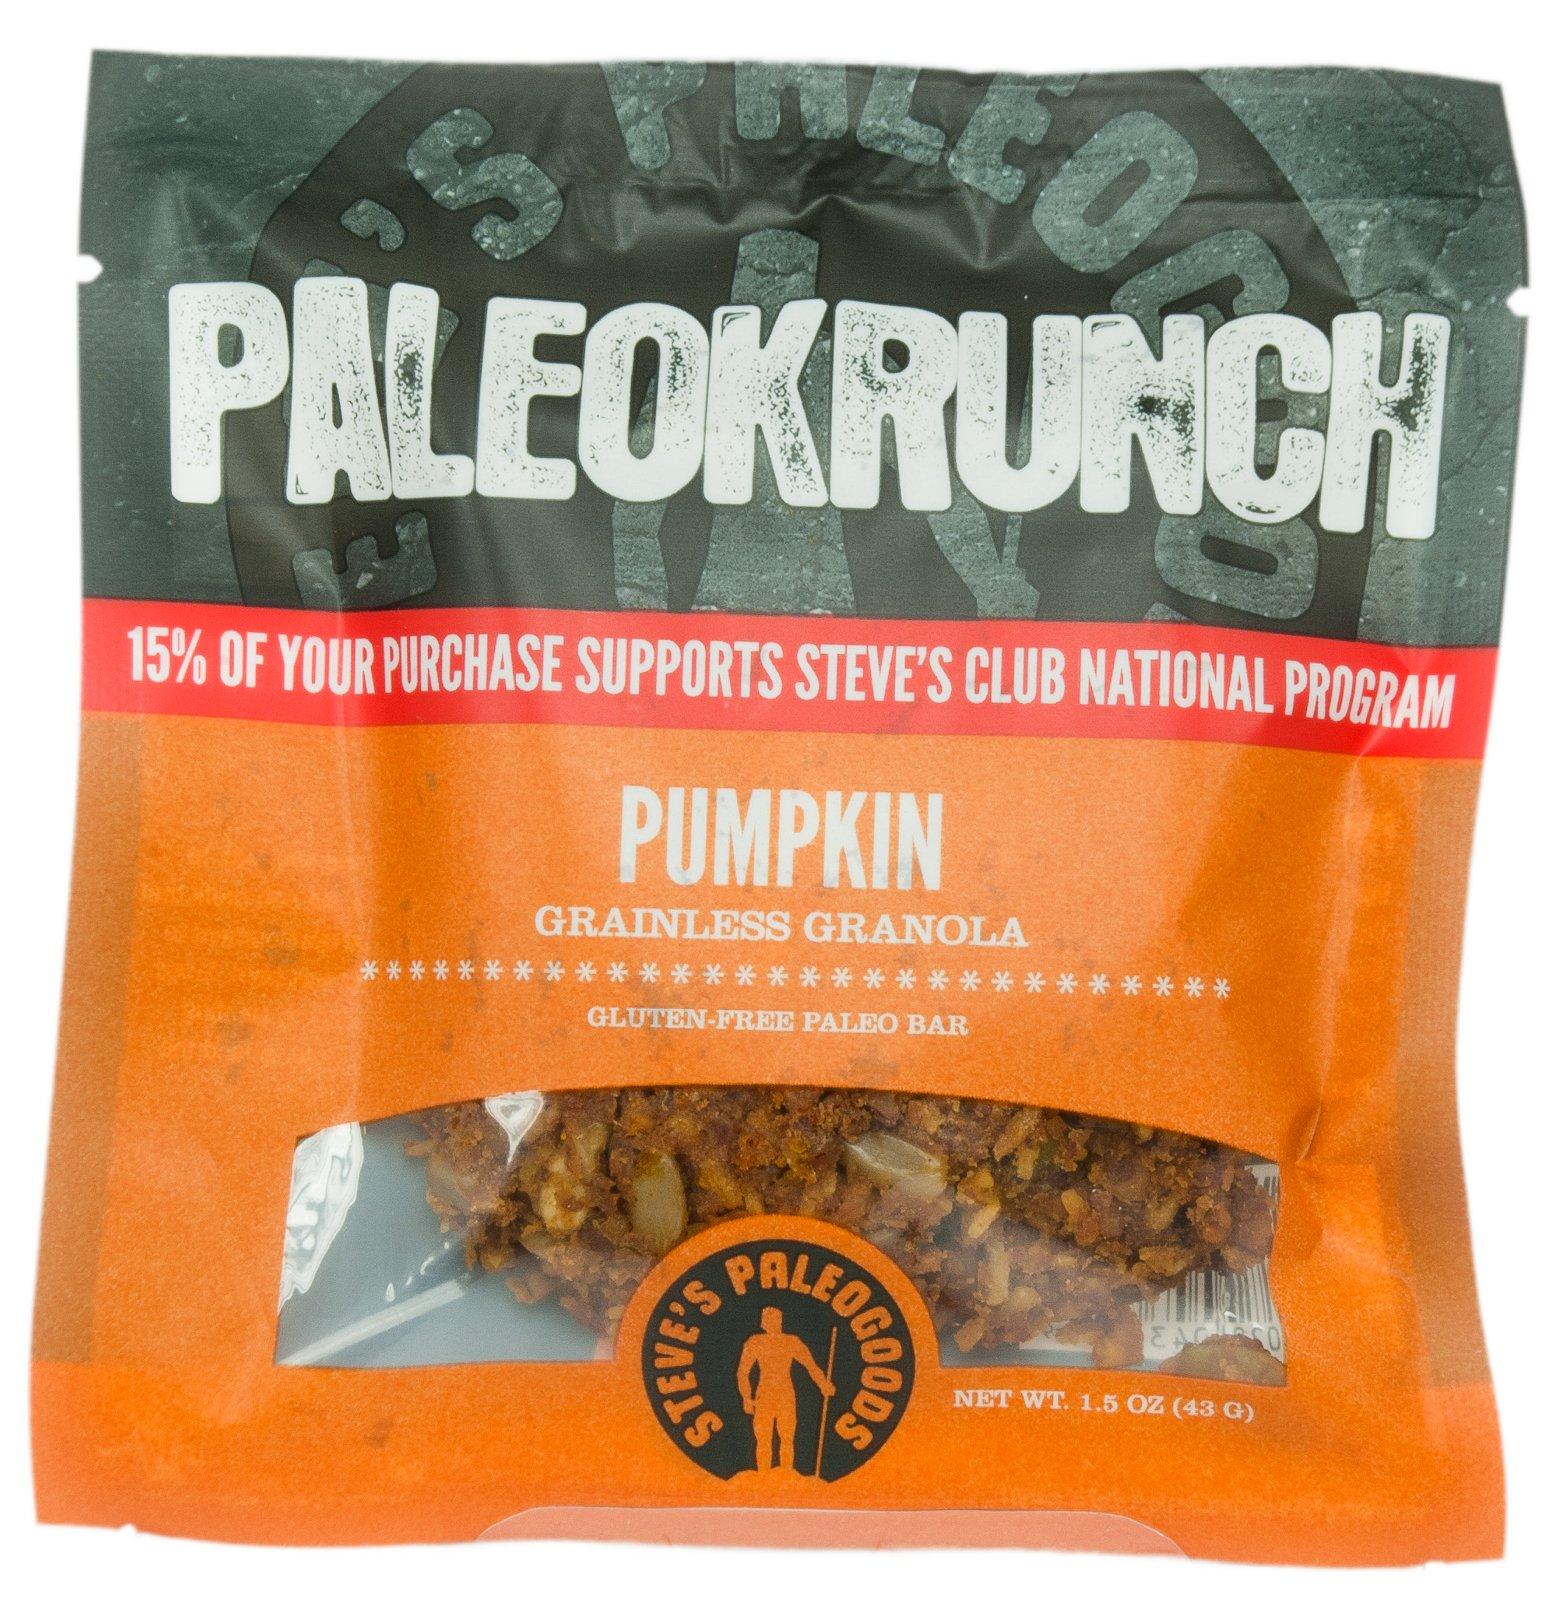 Steve's PaleoGoods Pumpkin PaleoKrunch Bar 1.5oz (case of 6)